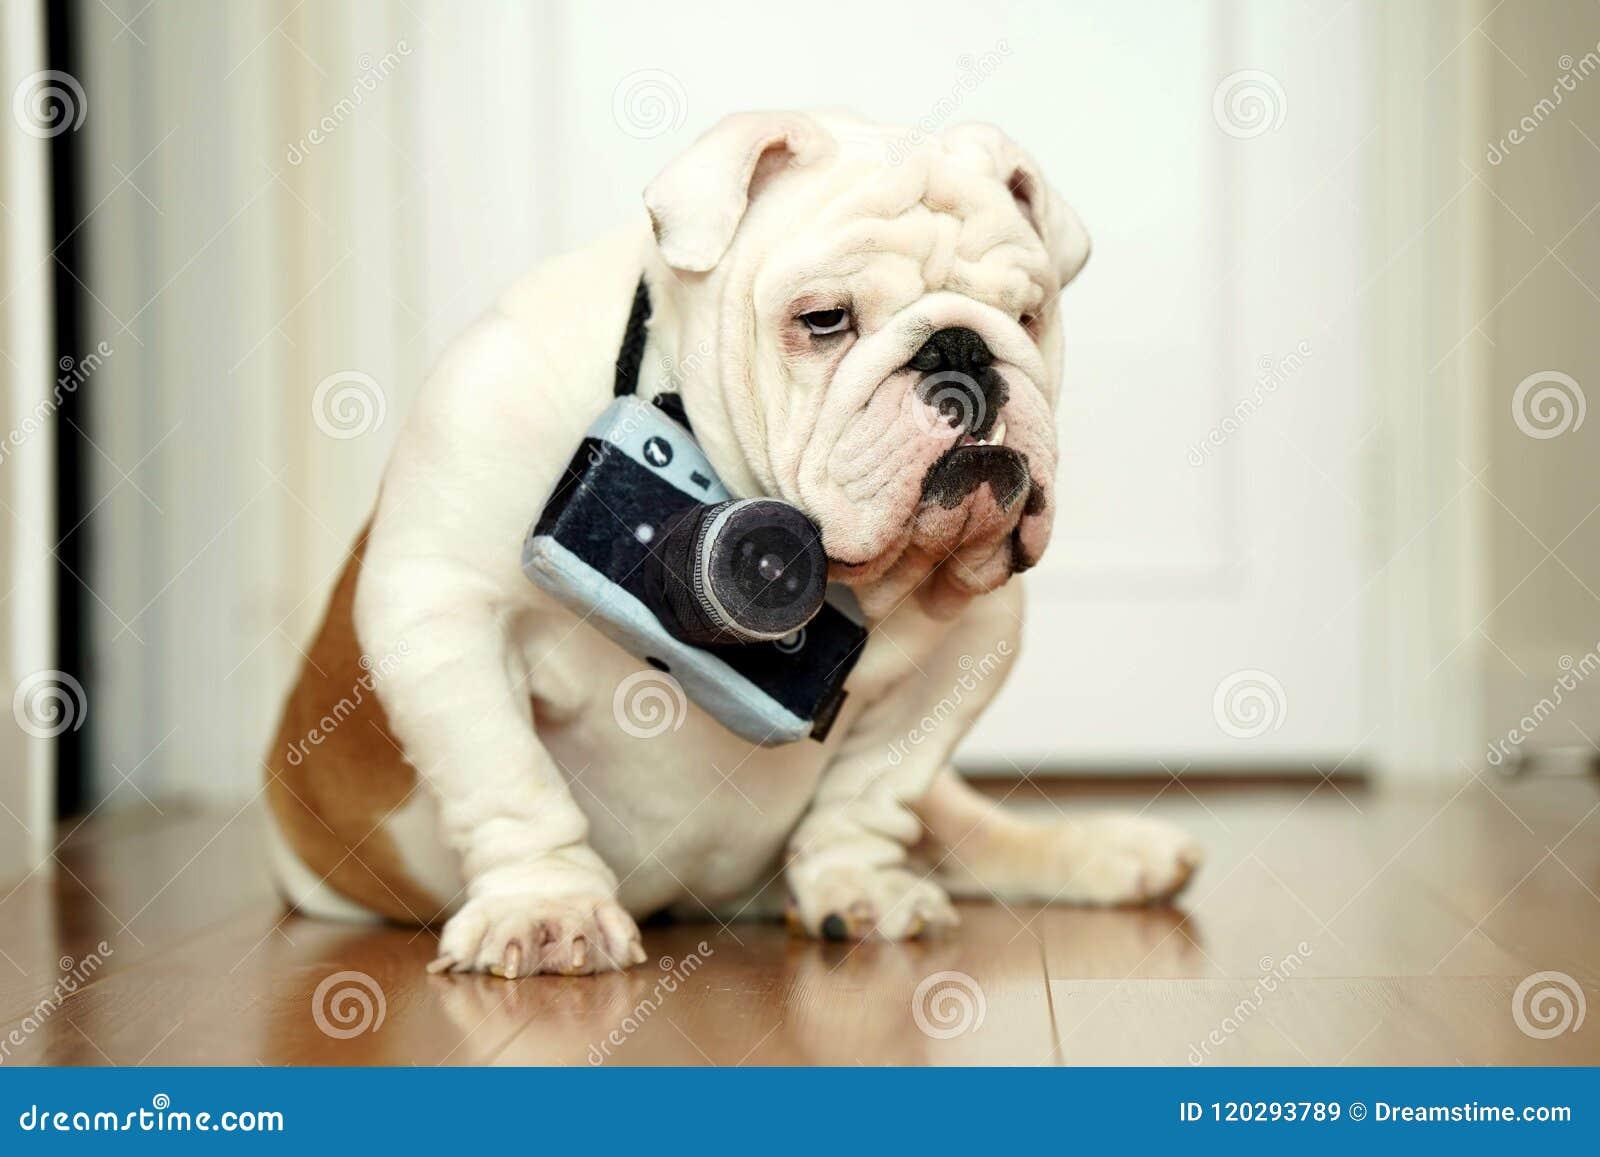 Pet English Bulldog Posing As A Photographer With A Stuffed Camera